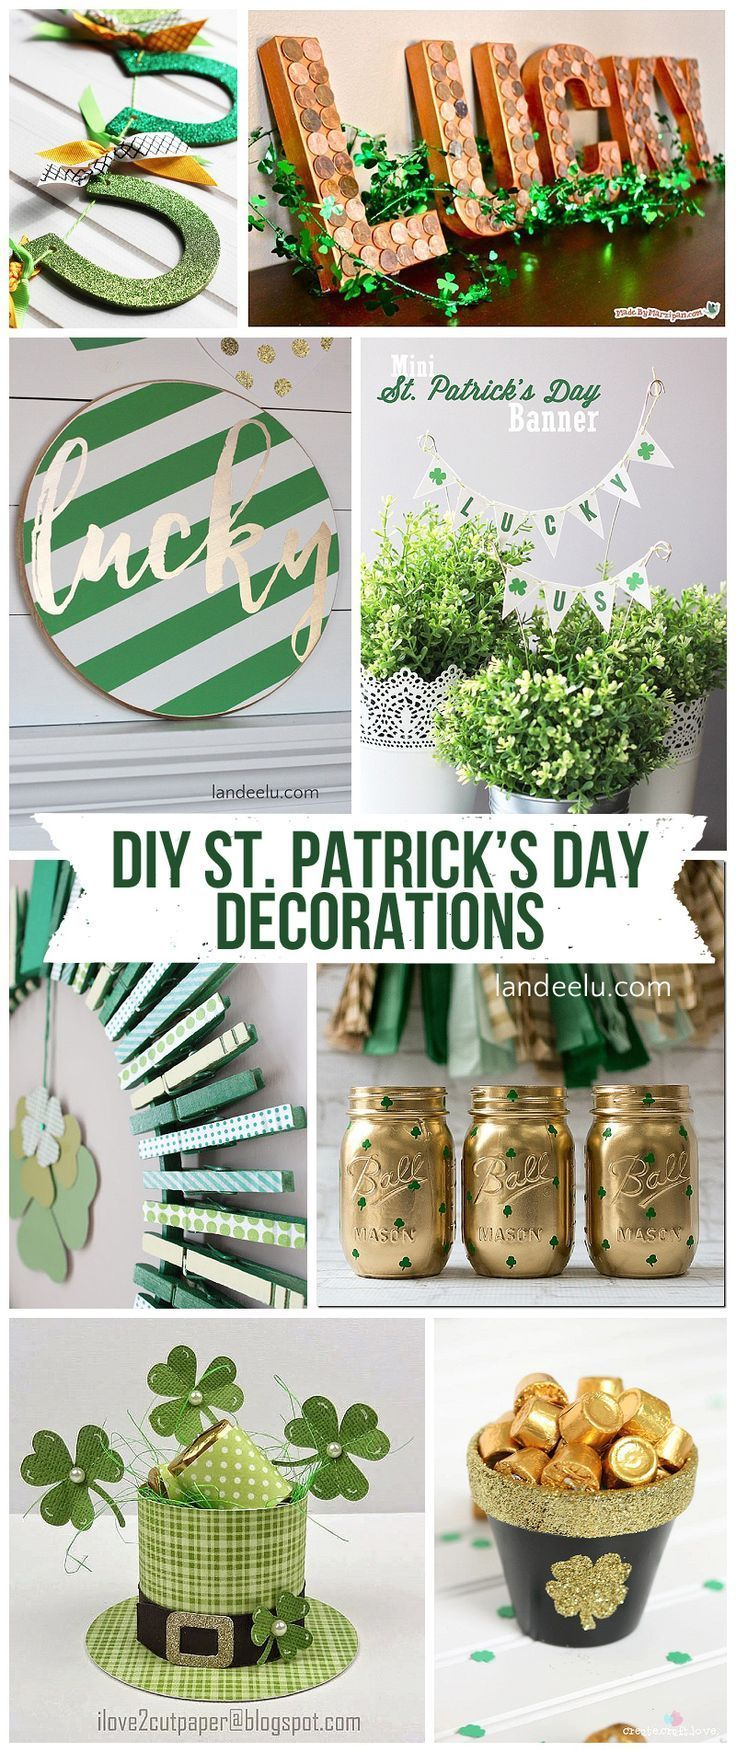 Diy St Patrick S Day Decorations St Patrick S Day Decorations St Patrick S Day Diy St Patrick S Day Crafts